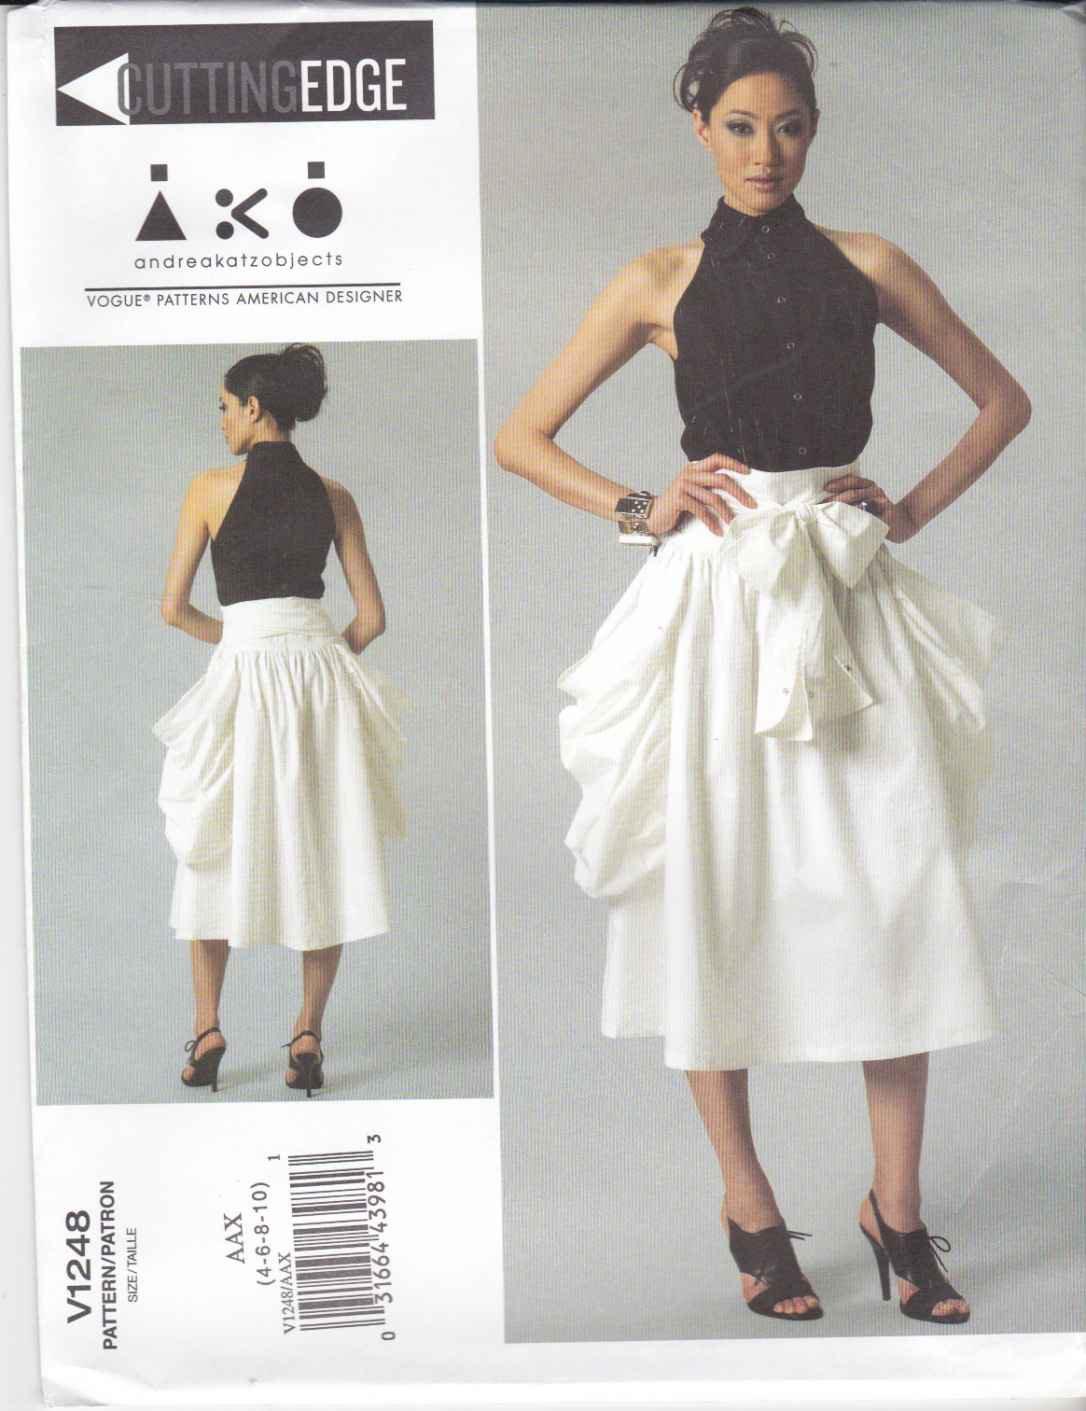 Vogue Sewing Pattern 1248 Misses Size 4-10 AKO Andreakatzobjects Sleeveless Top Skirt